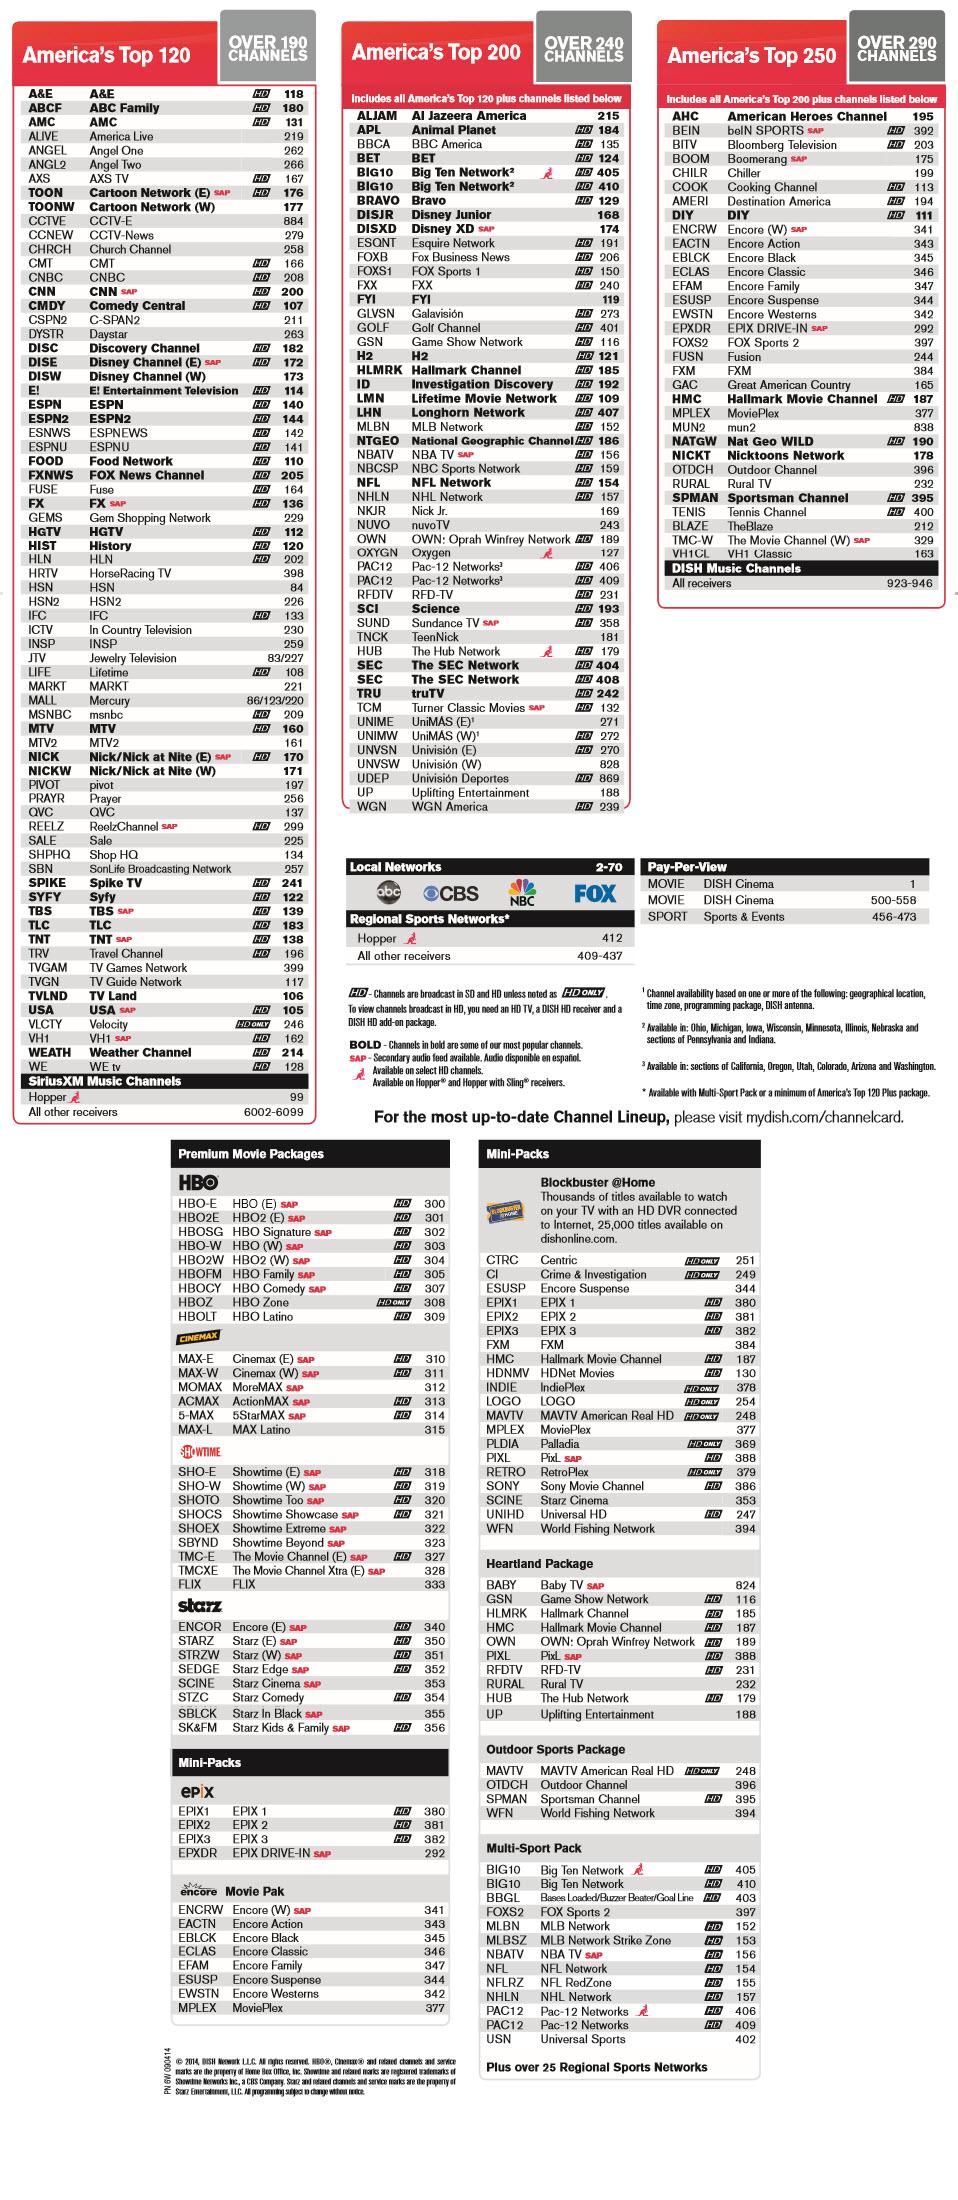 Agile image inside dish america's top 200 printable channel list